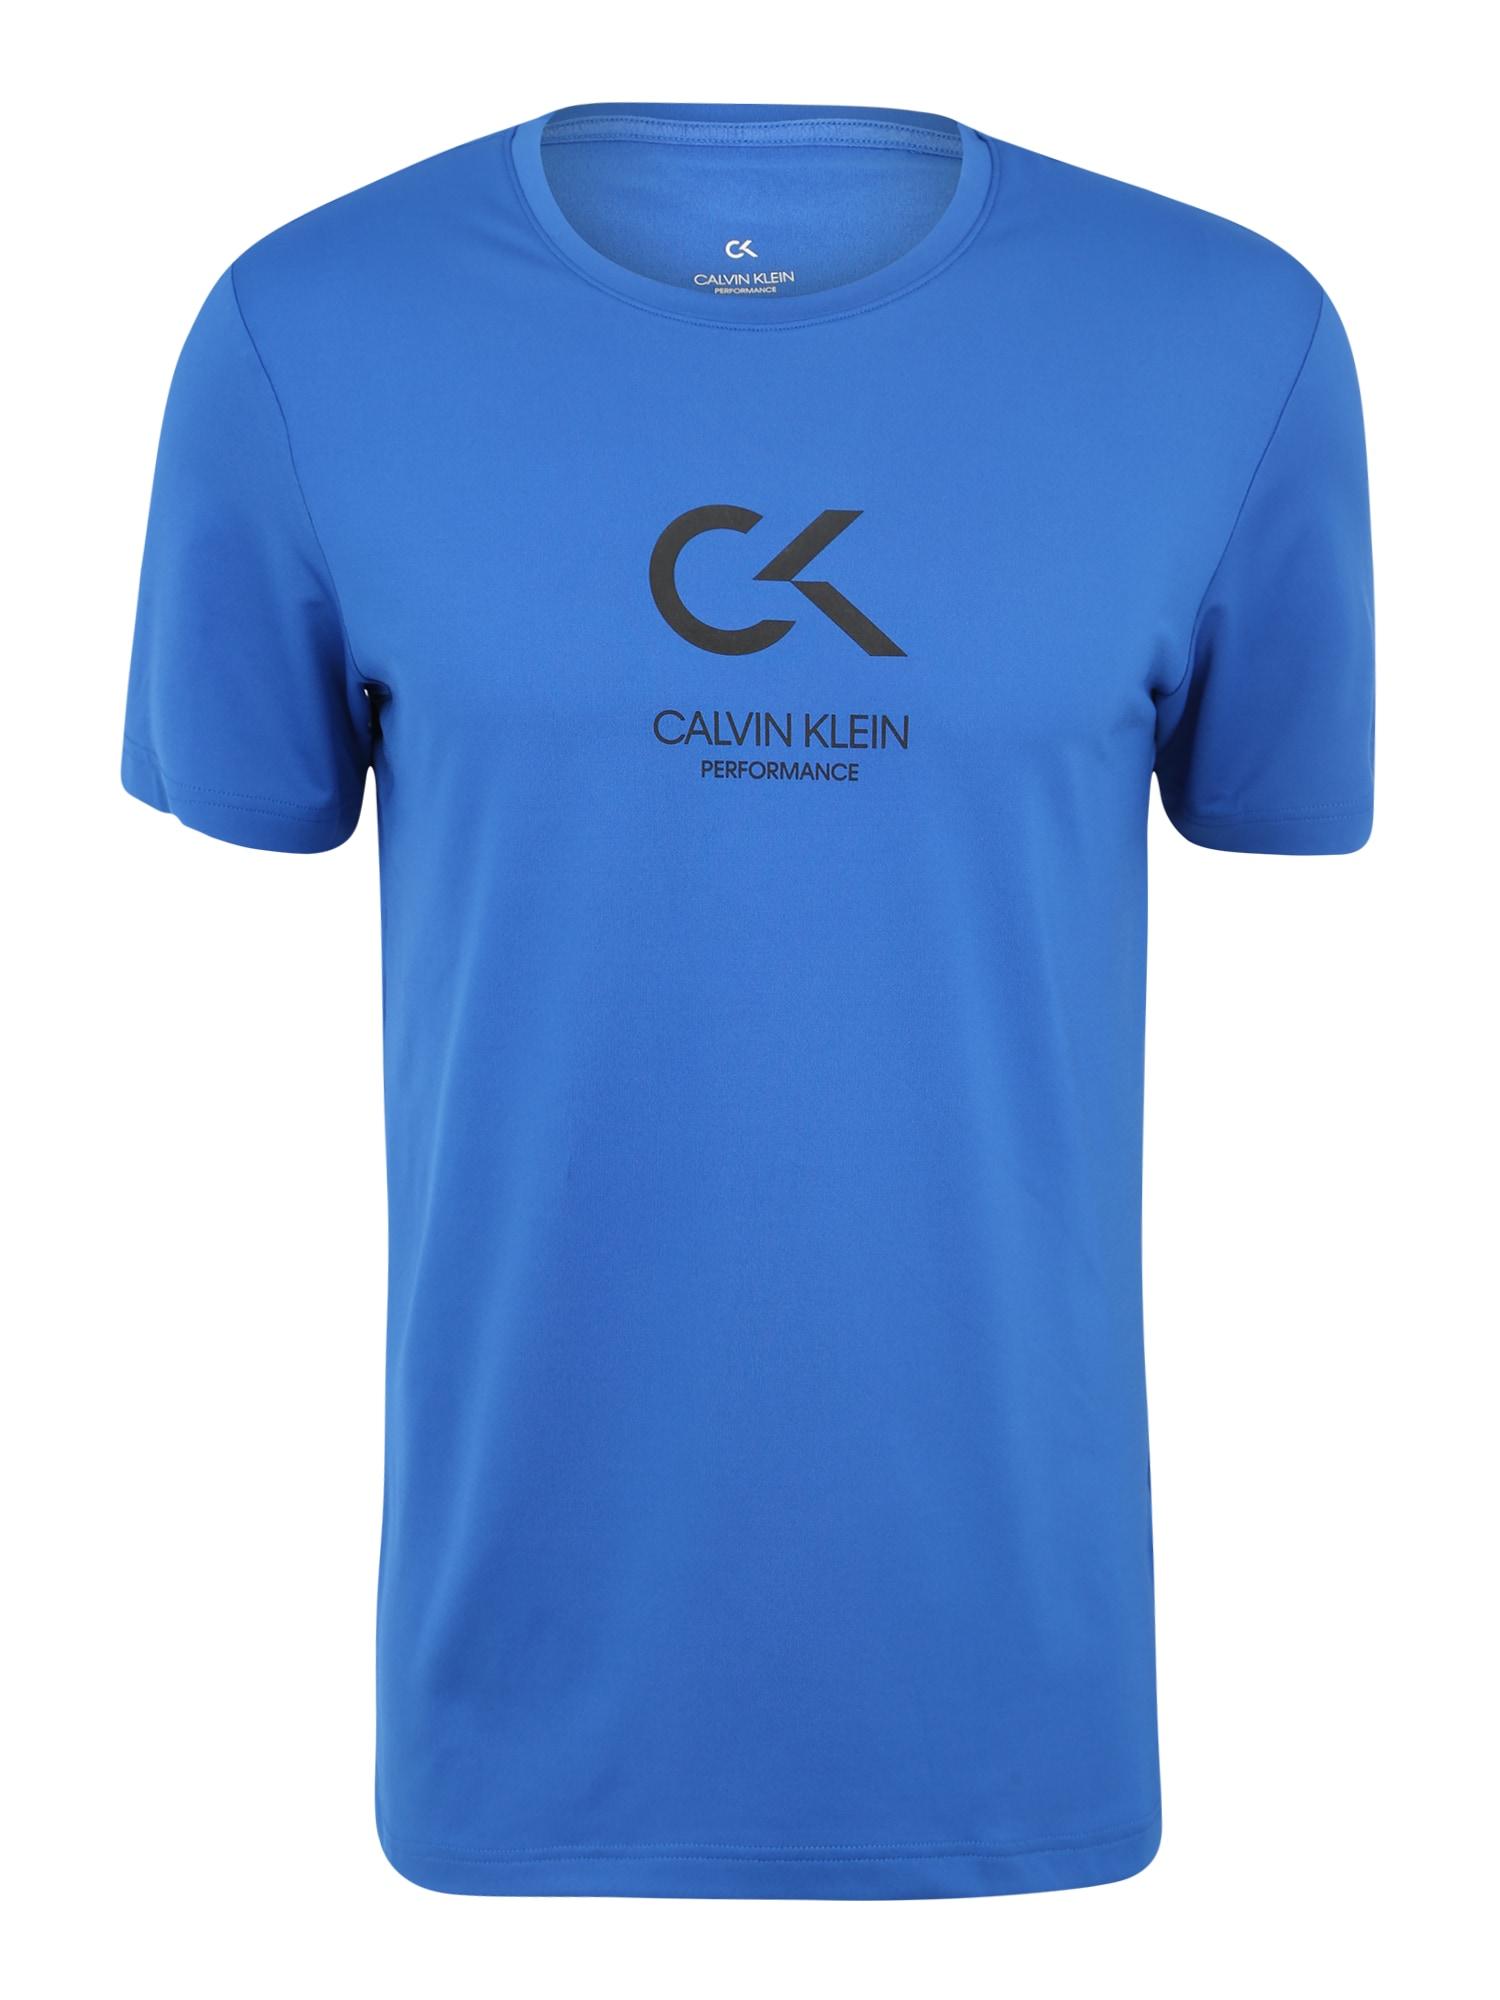 Funkční tričko SHORT SLEEVE LOGO TEE modrá bílá Calvin Klein Performance